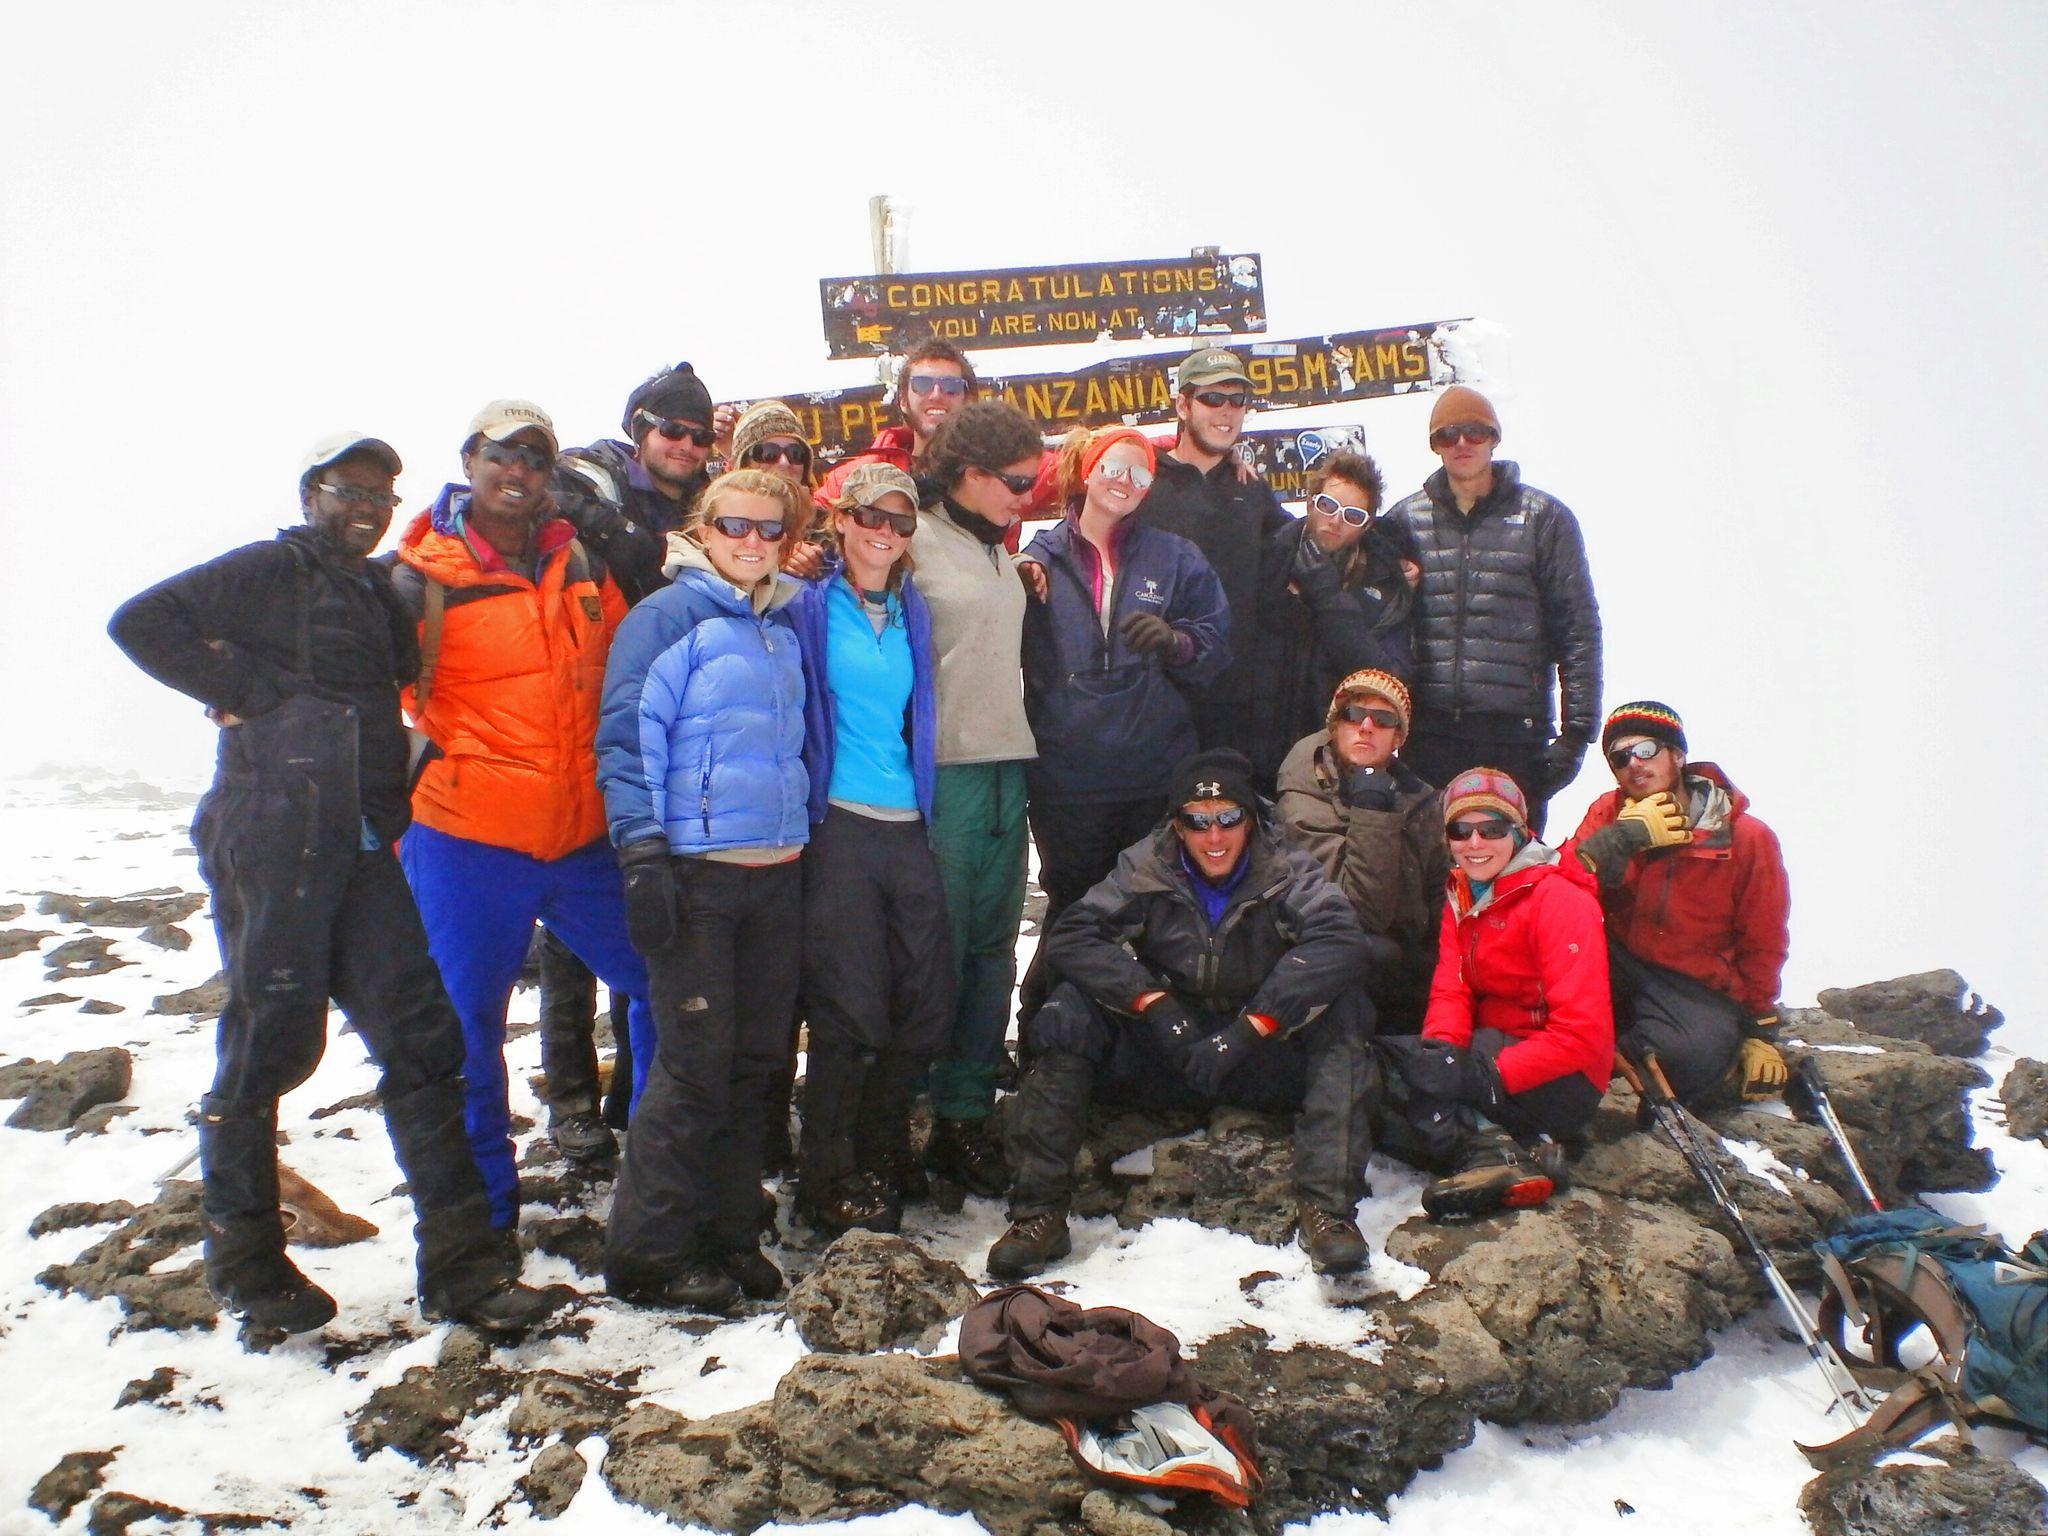 Gap Year Program - NOLS Fall Semester in East Africa  2